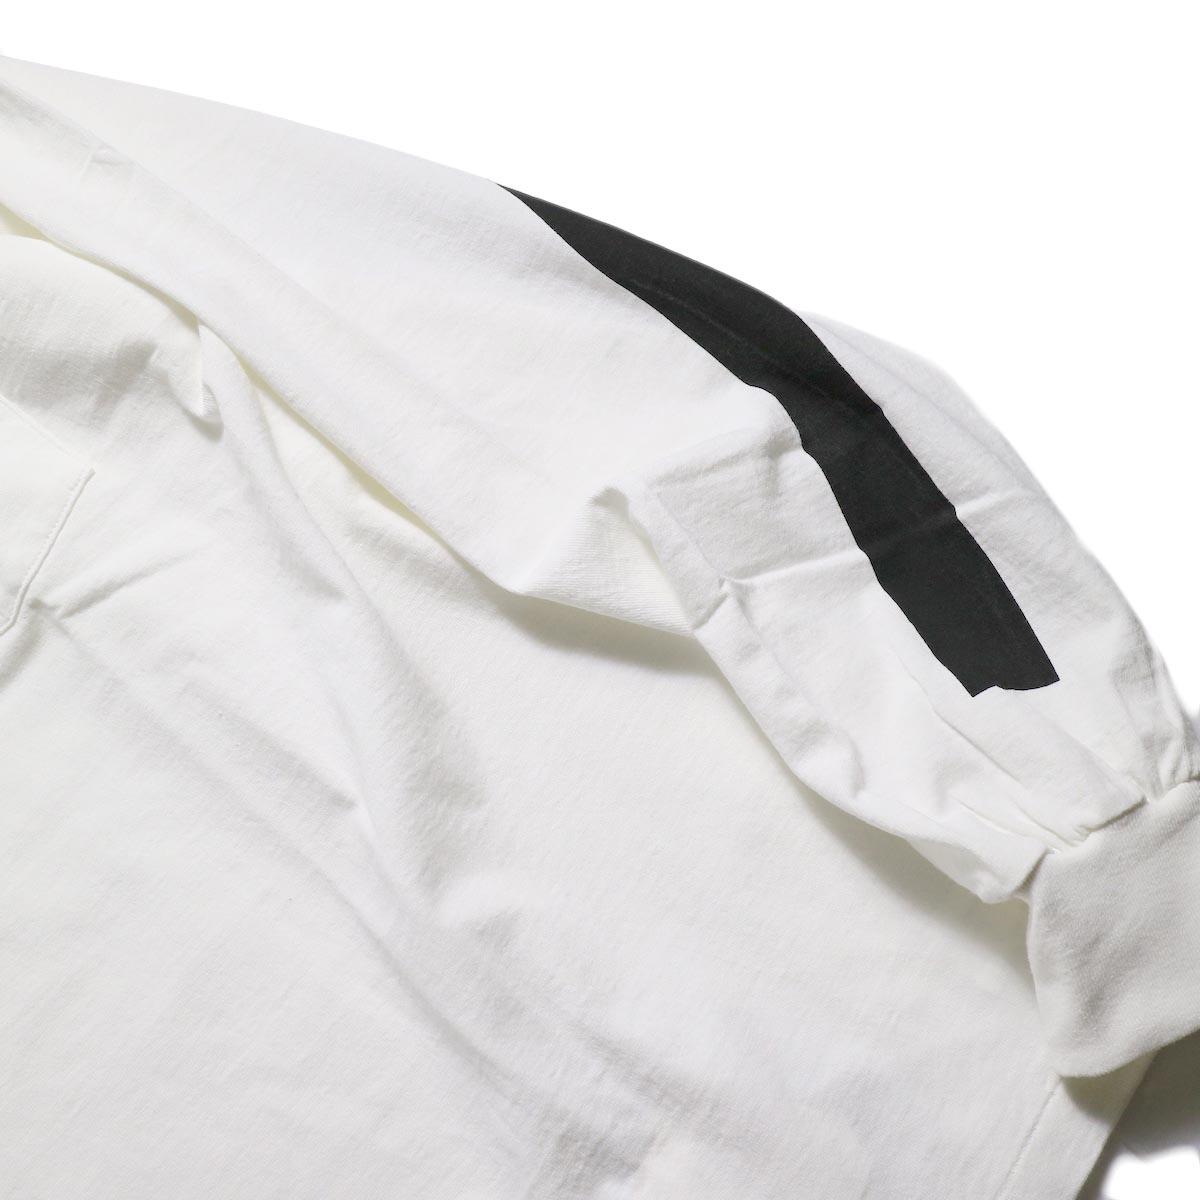 Kaptain Sunshine / West Coast L/S Tee -White × Black & Grey Line 左袖